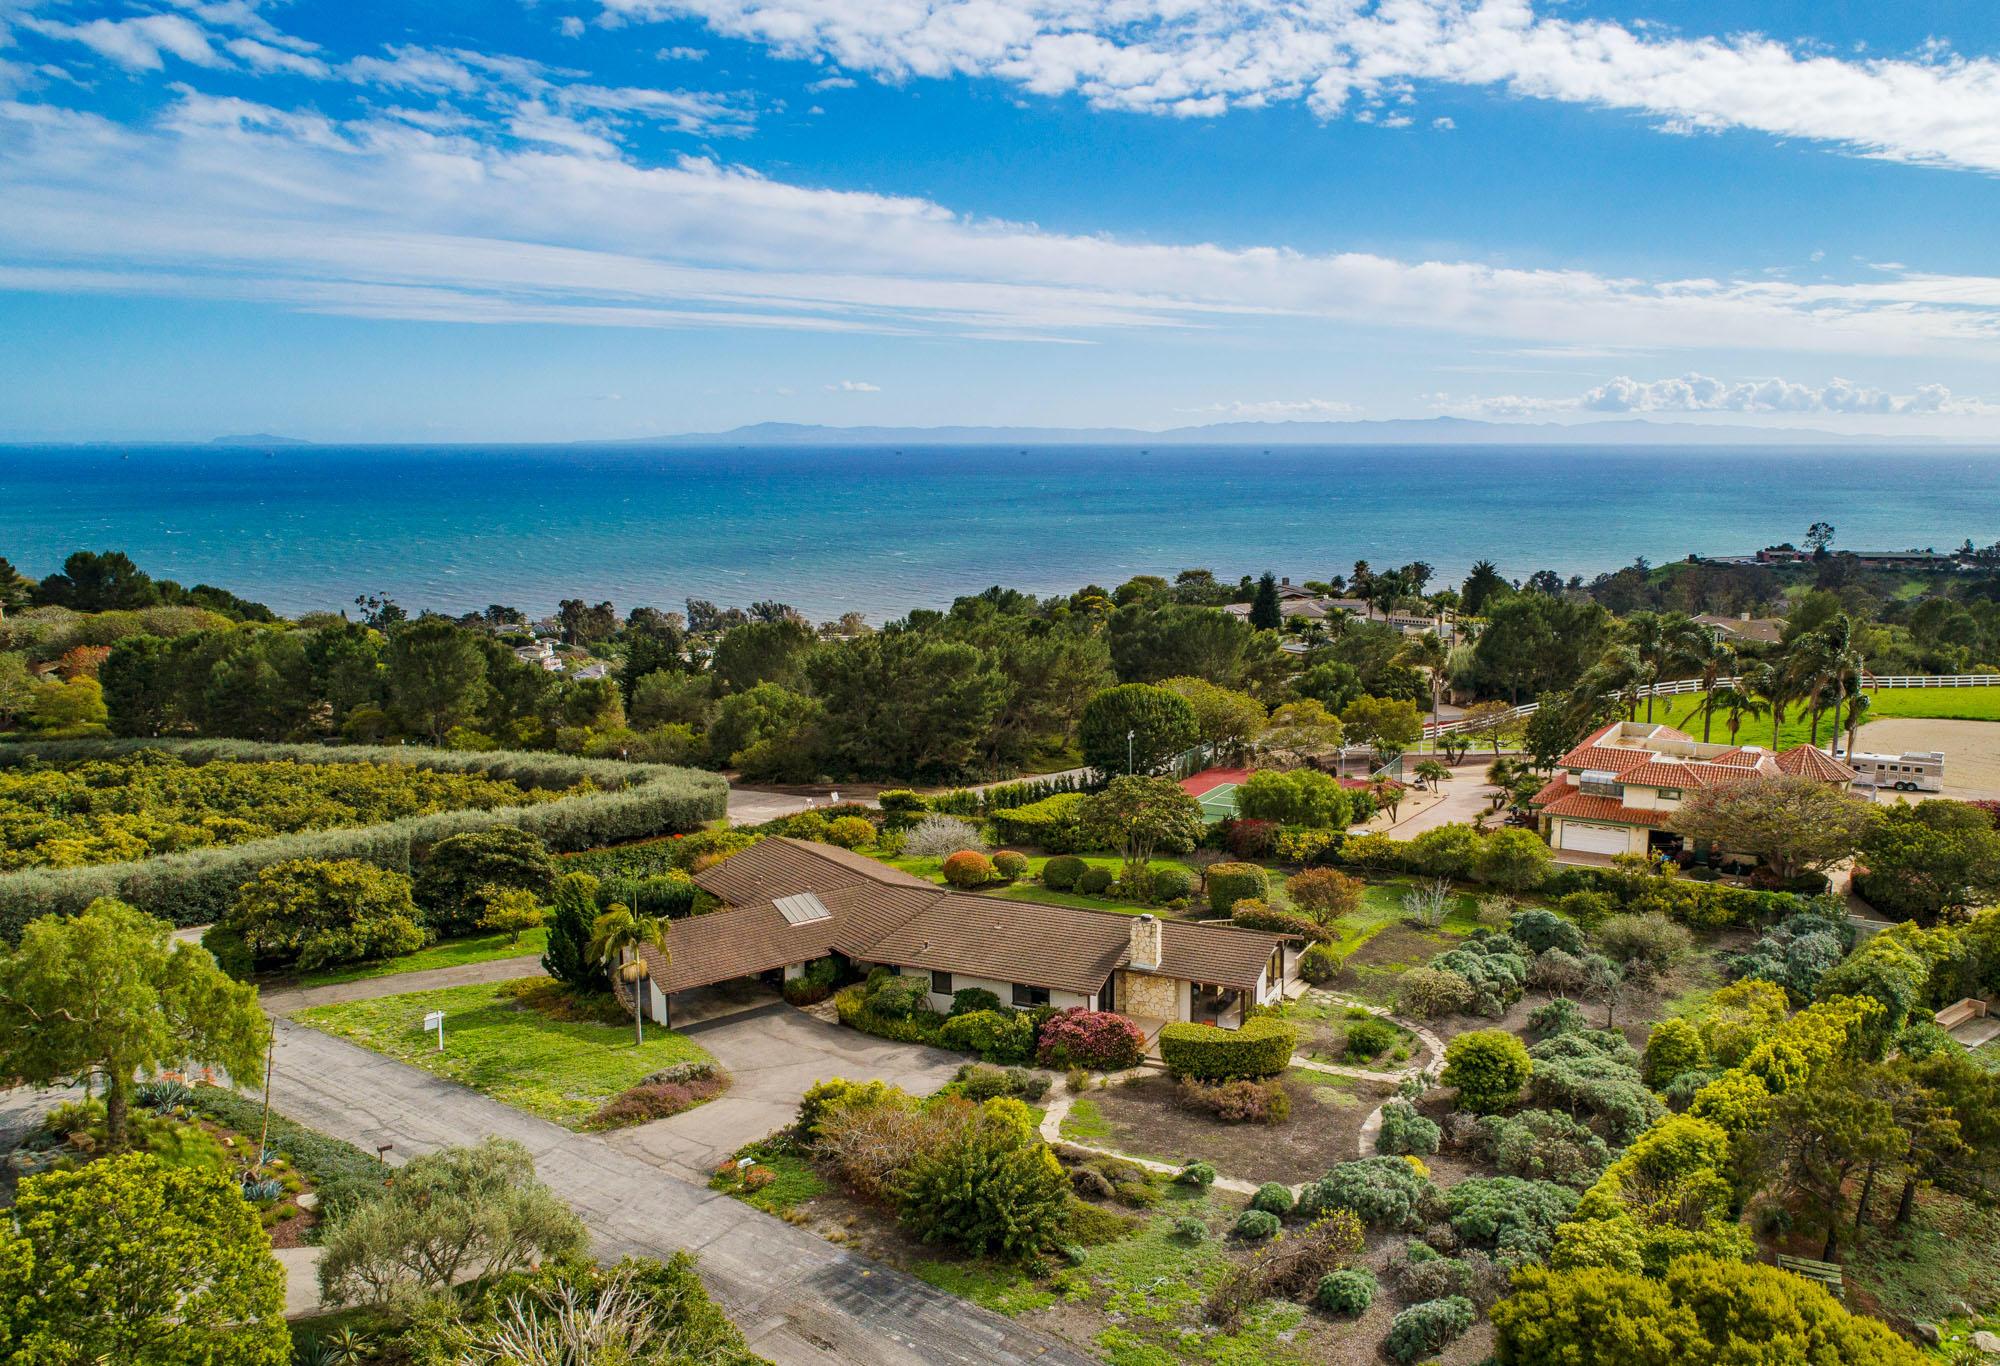 Property photo for 349 Ridgecrest Dr Santa Barbara, California 93108 - 18-1000